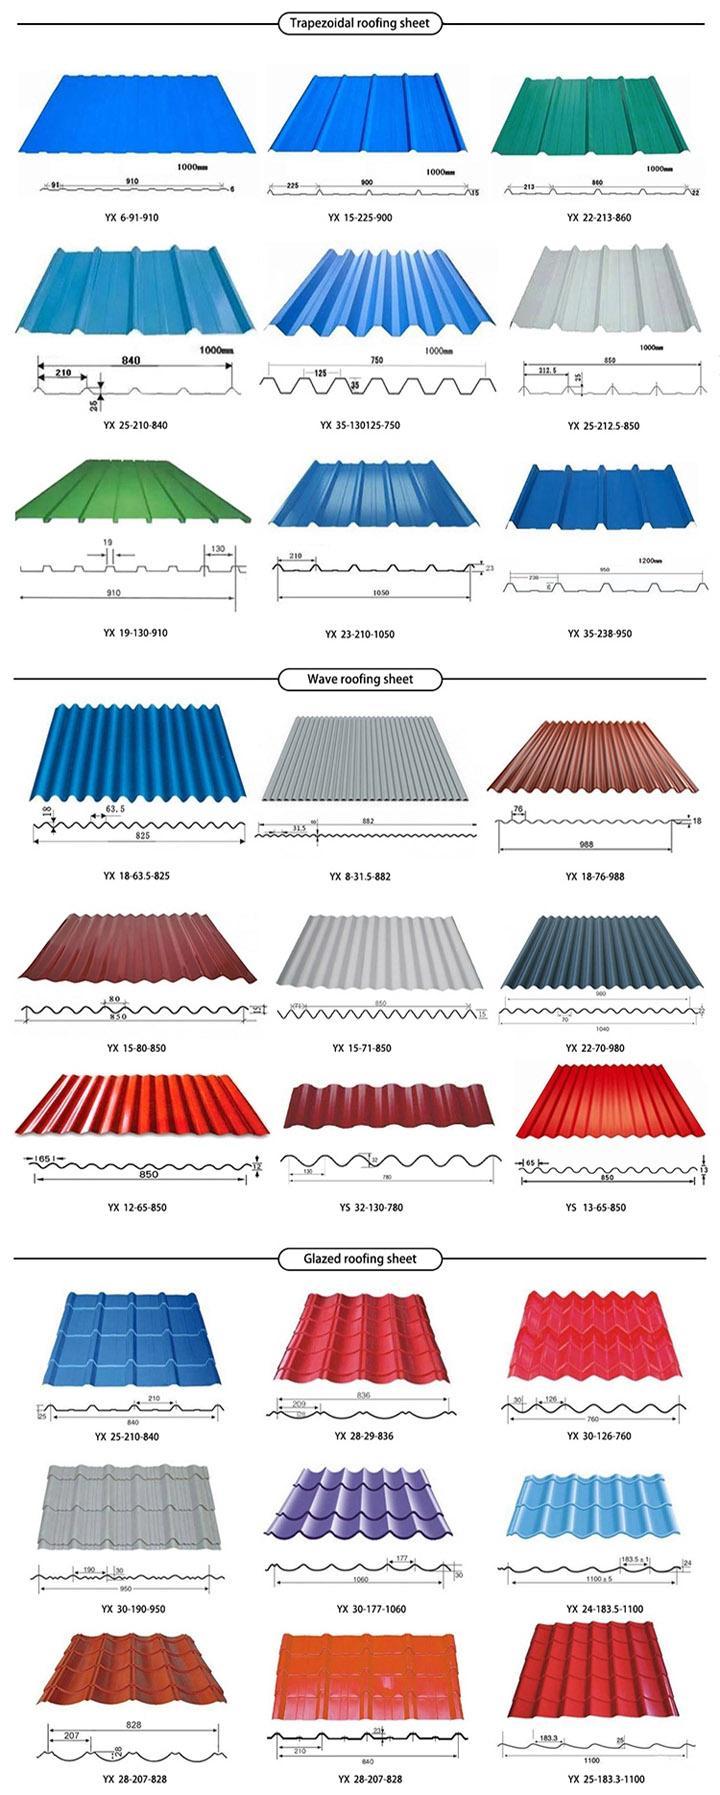 Prepainted galvanized steel coils 11